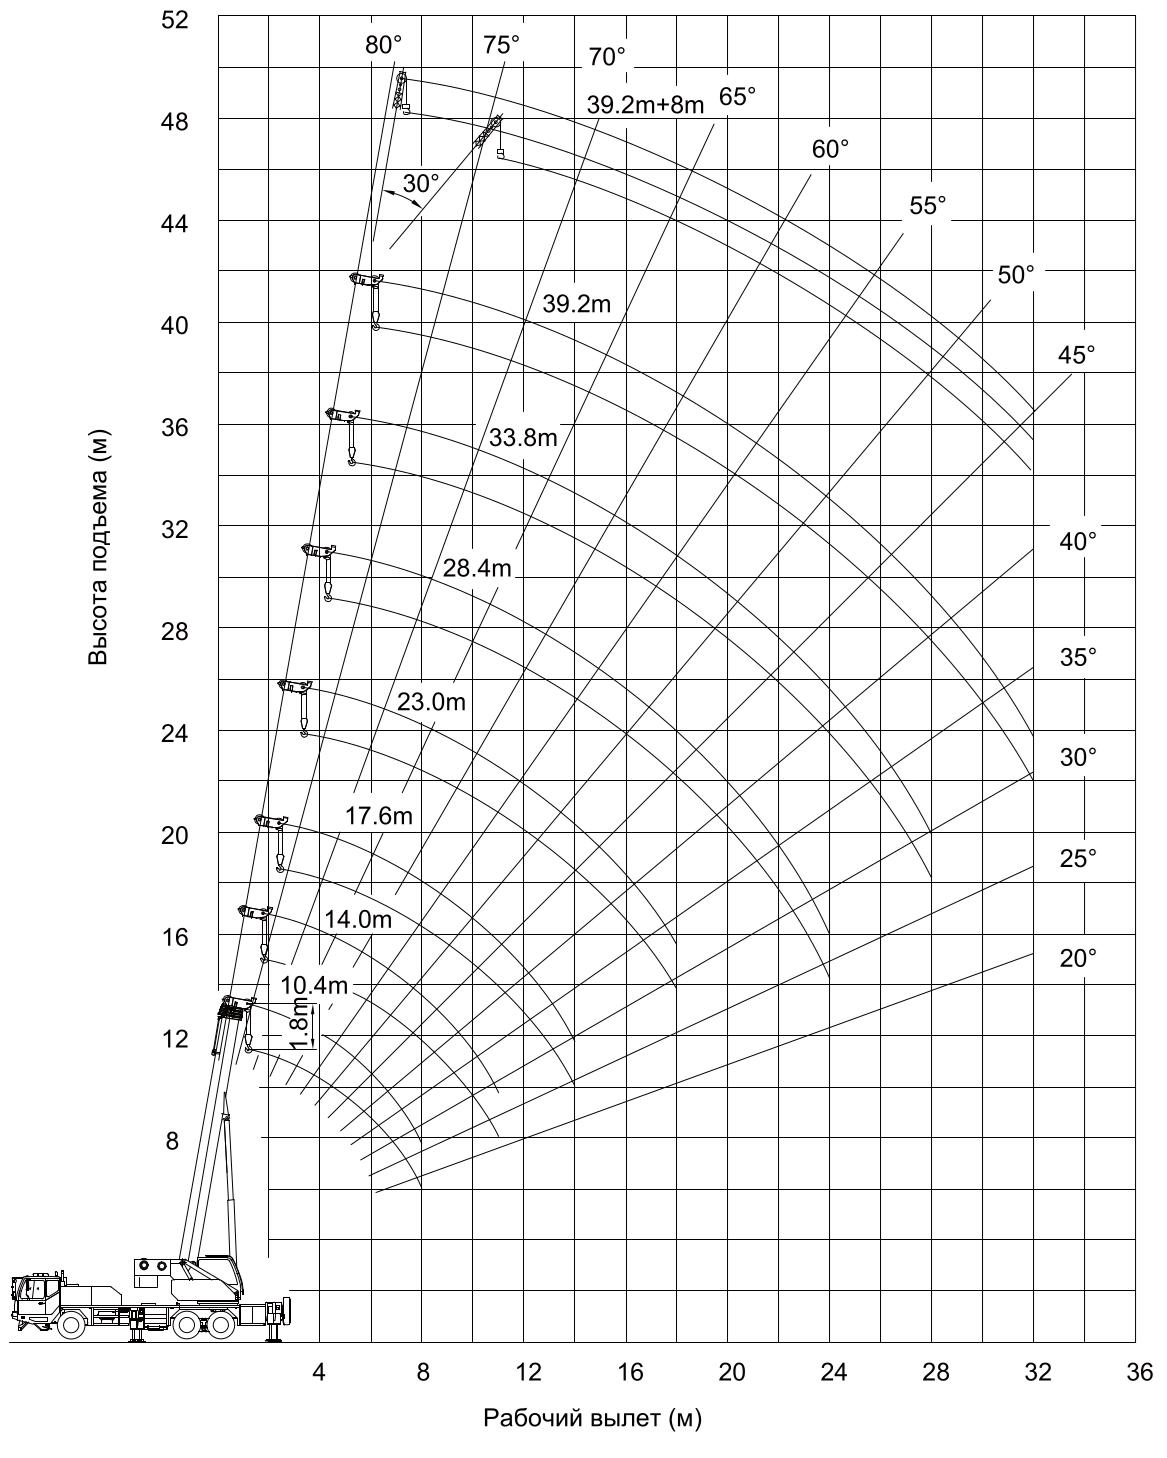 Грузовысотные характеристики автокрана Zoomlion QY25V552.1T